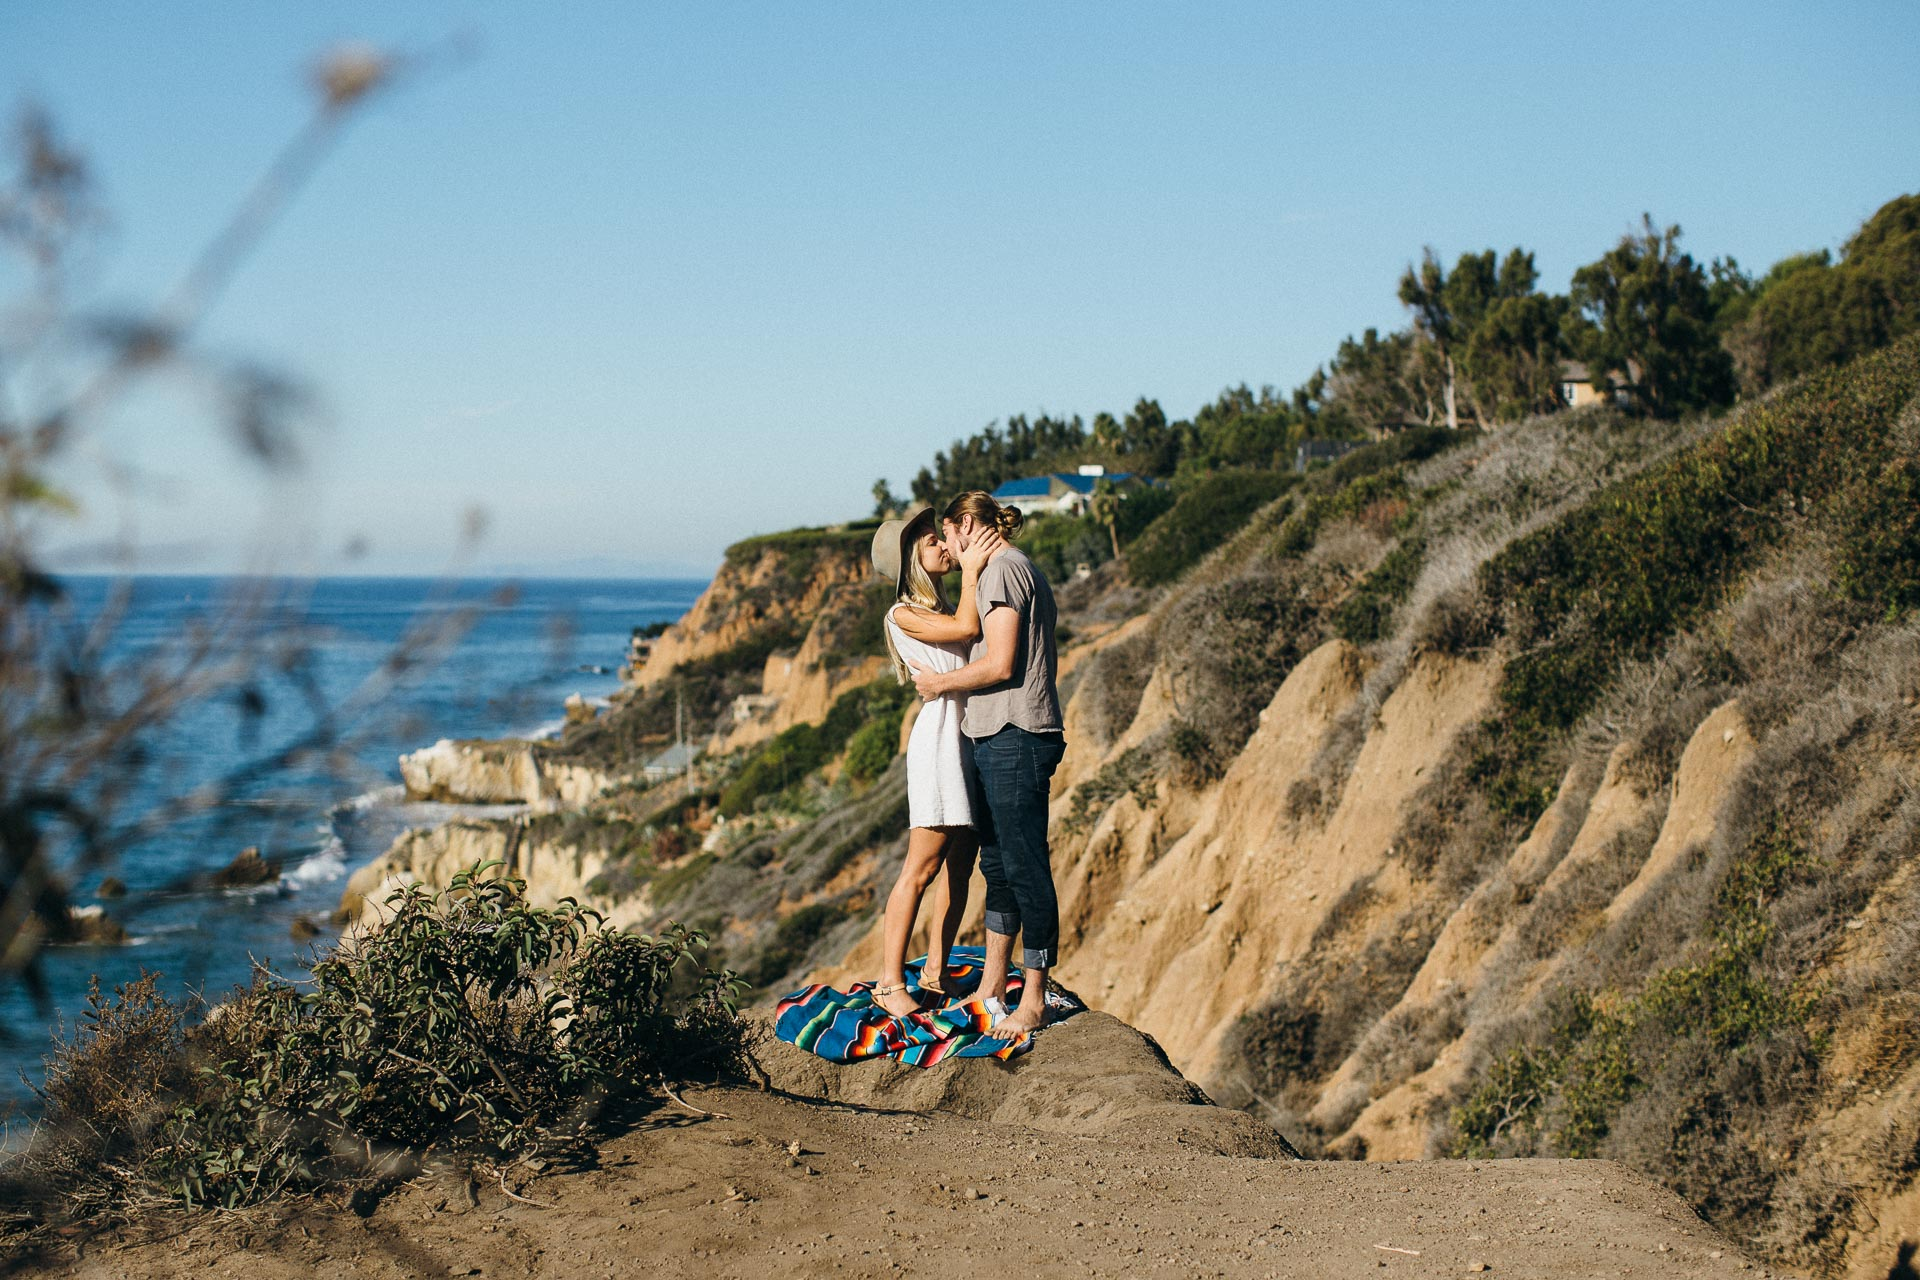 Carley_Jake_Lovesession_California_LosAngeles_ElMatadorBeach_JeanLaurentGaudy_064